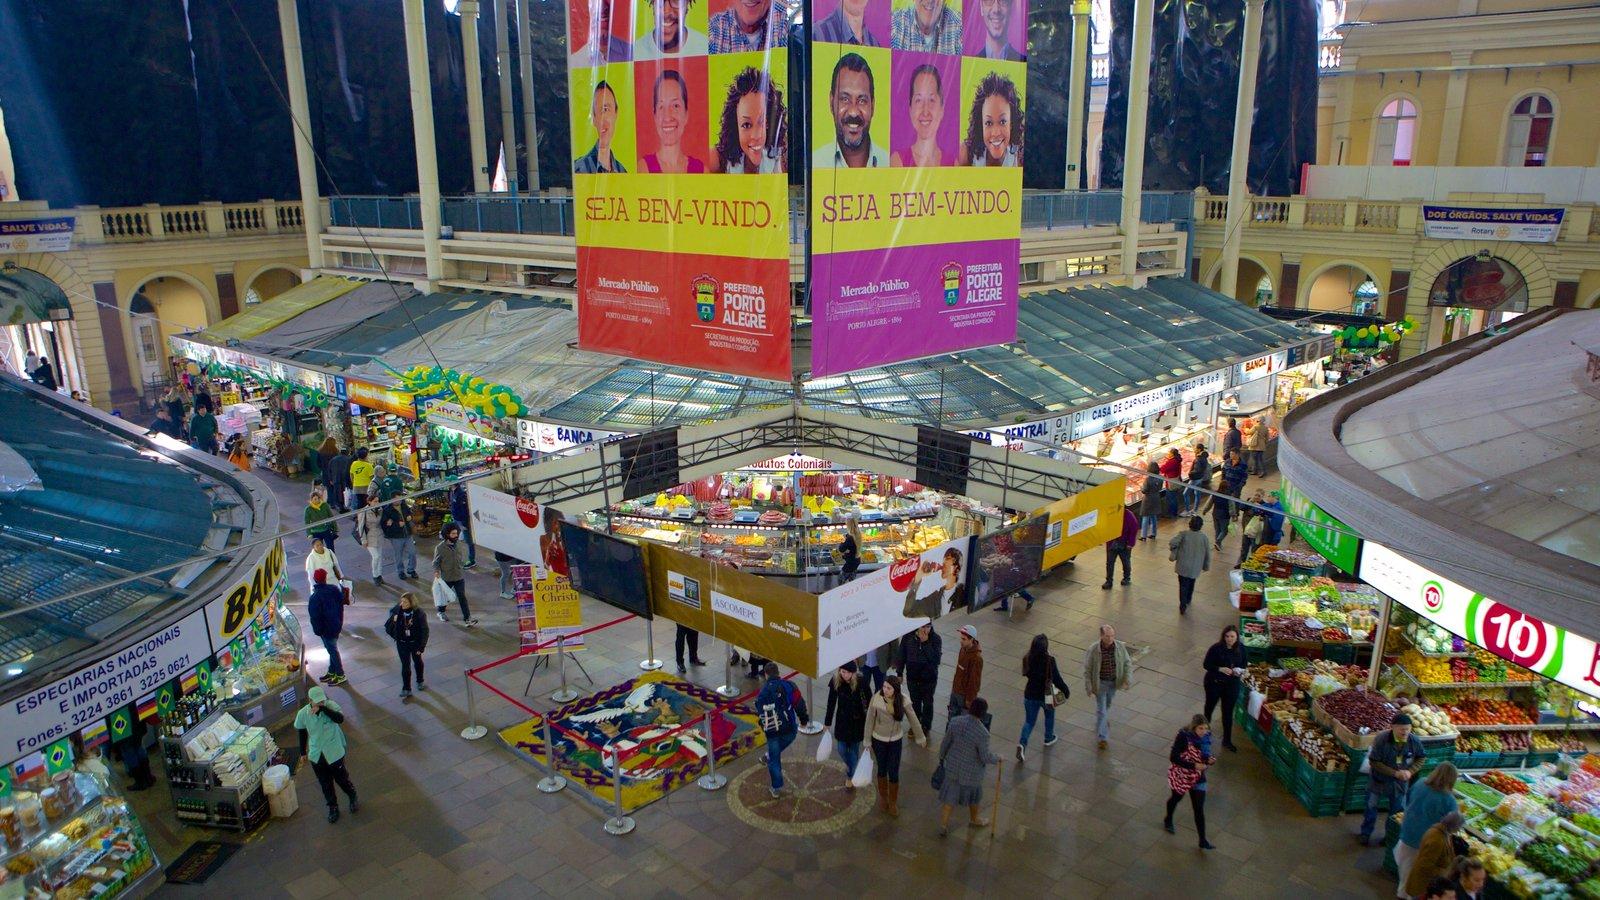 Mercado Público mostrando comida, cenas de rua e mercados